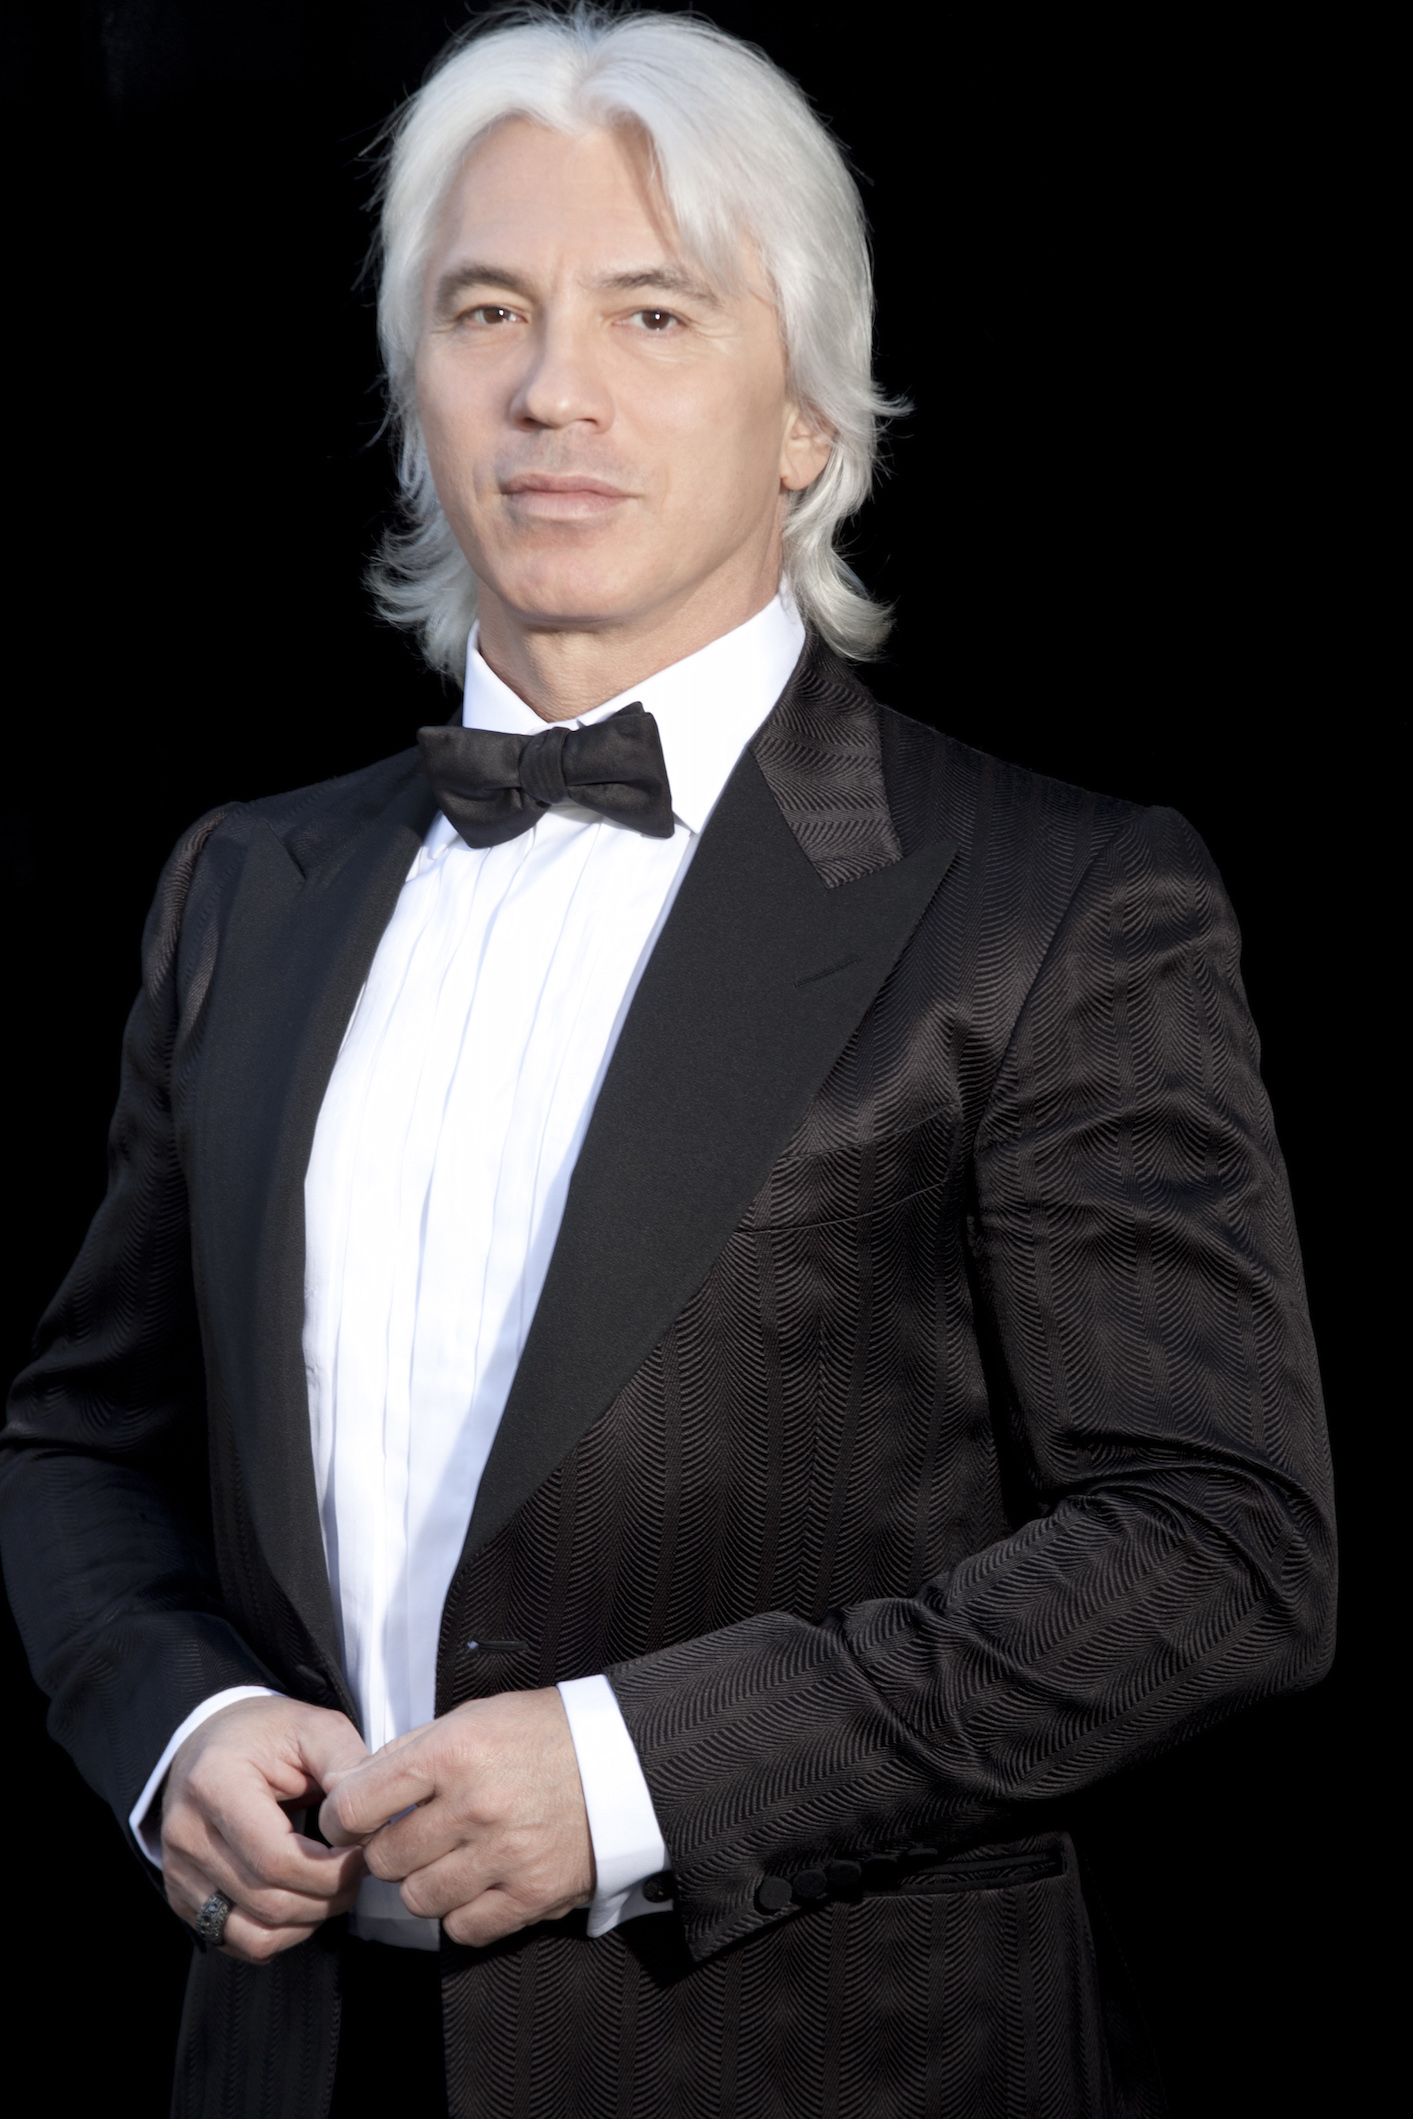 Baritone Dmitri Hvorostovsky dies aged 55